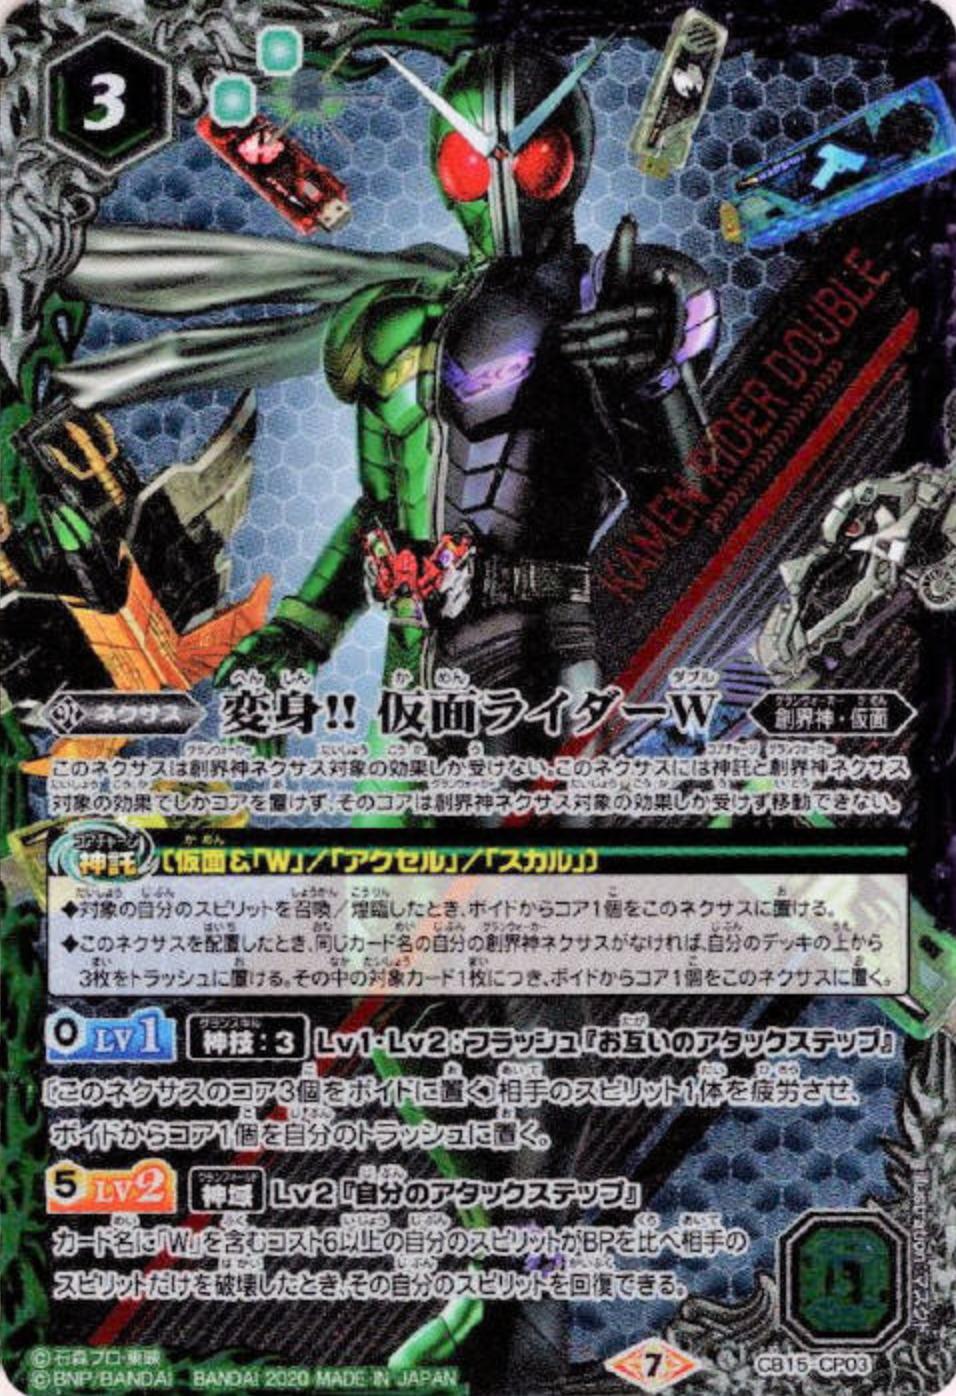 Henshin!! Kamen Rider W